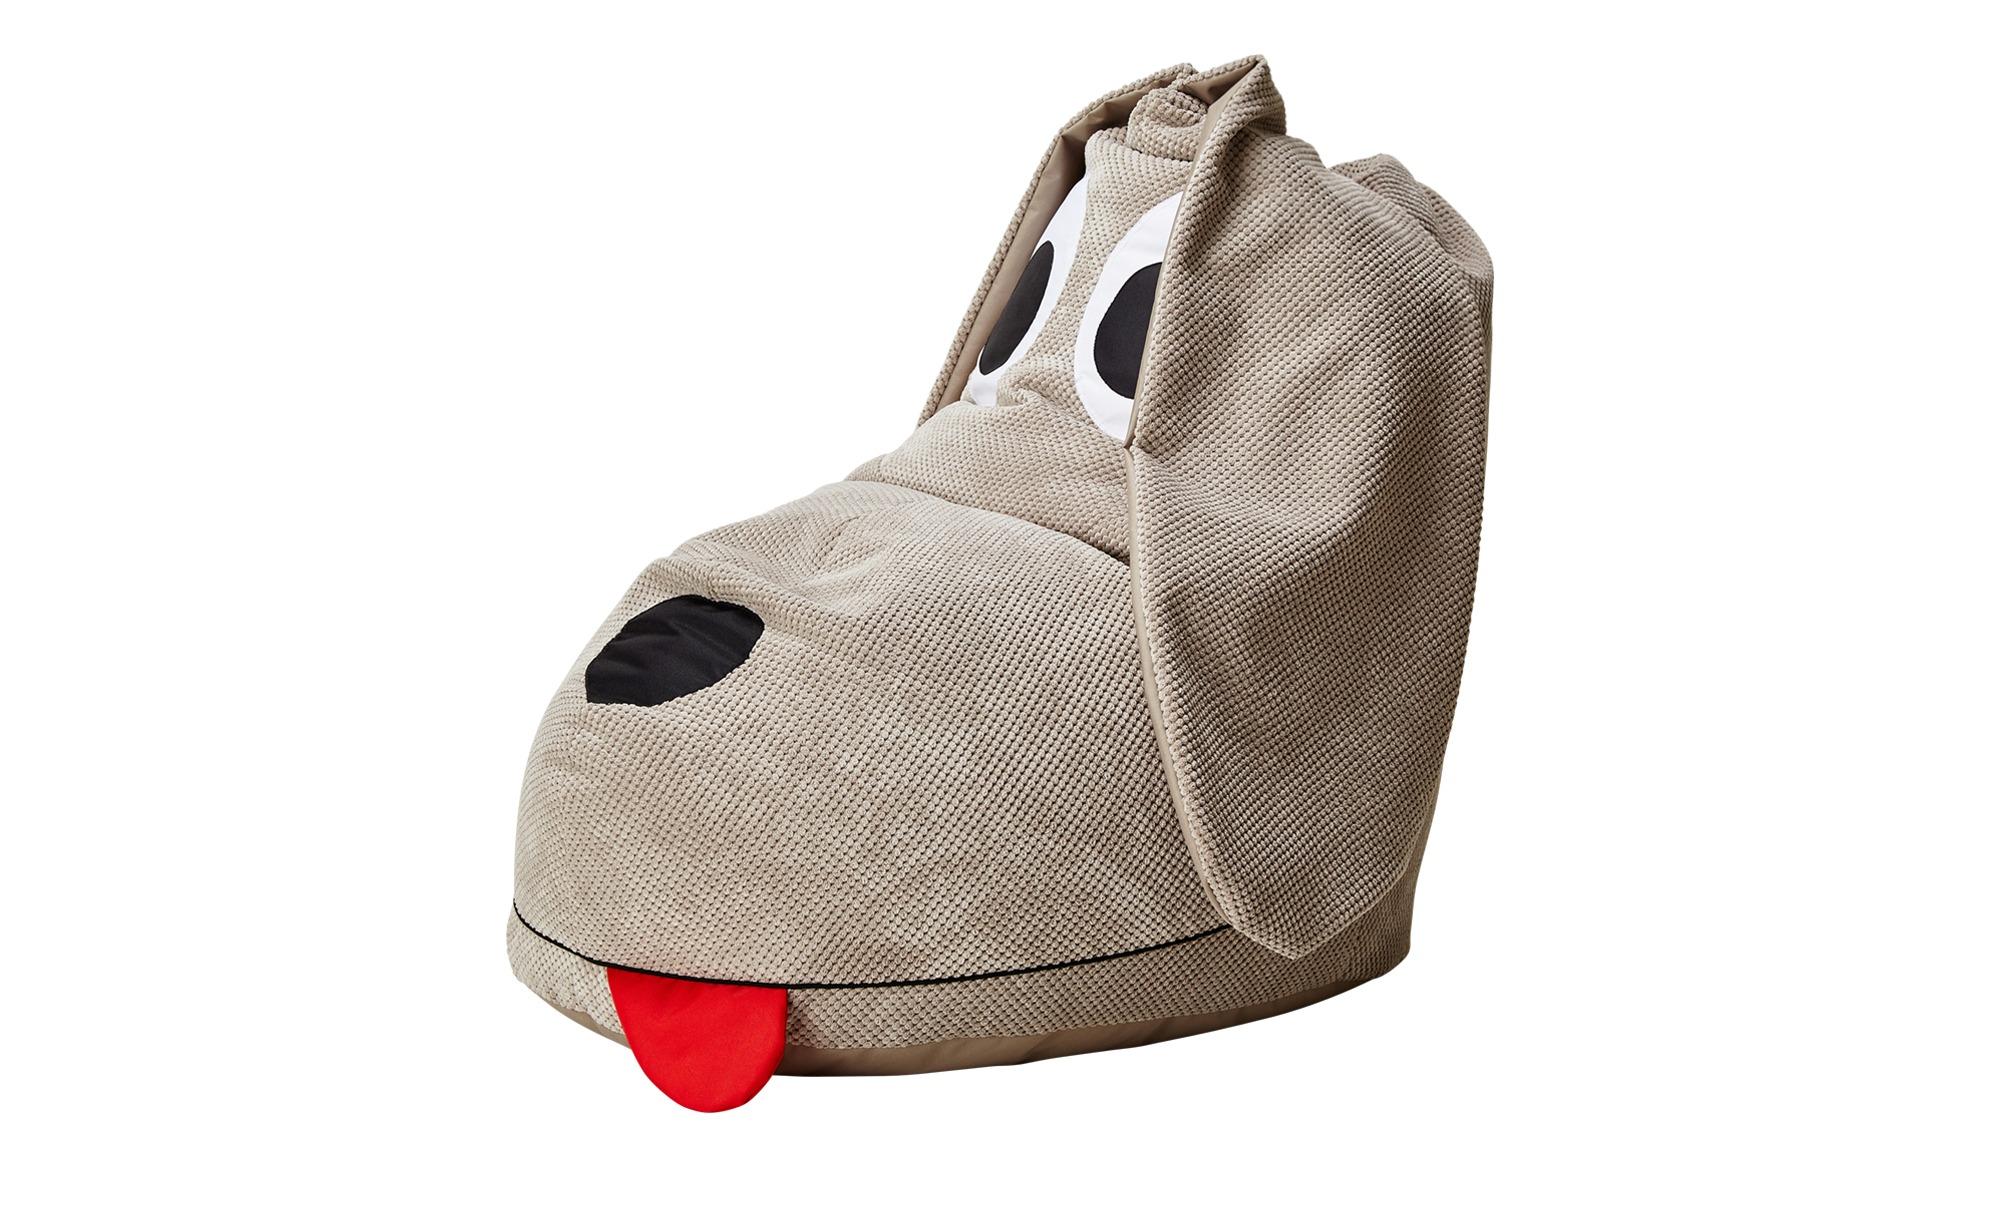 Motiv-Sitzsack 'Dog'